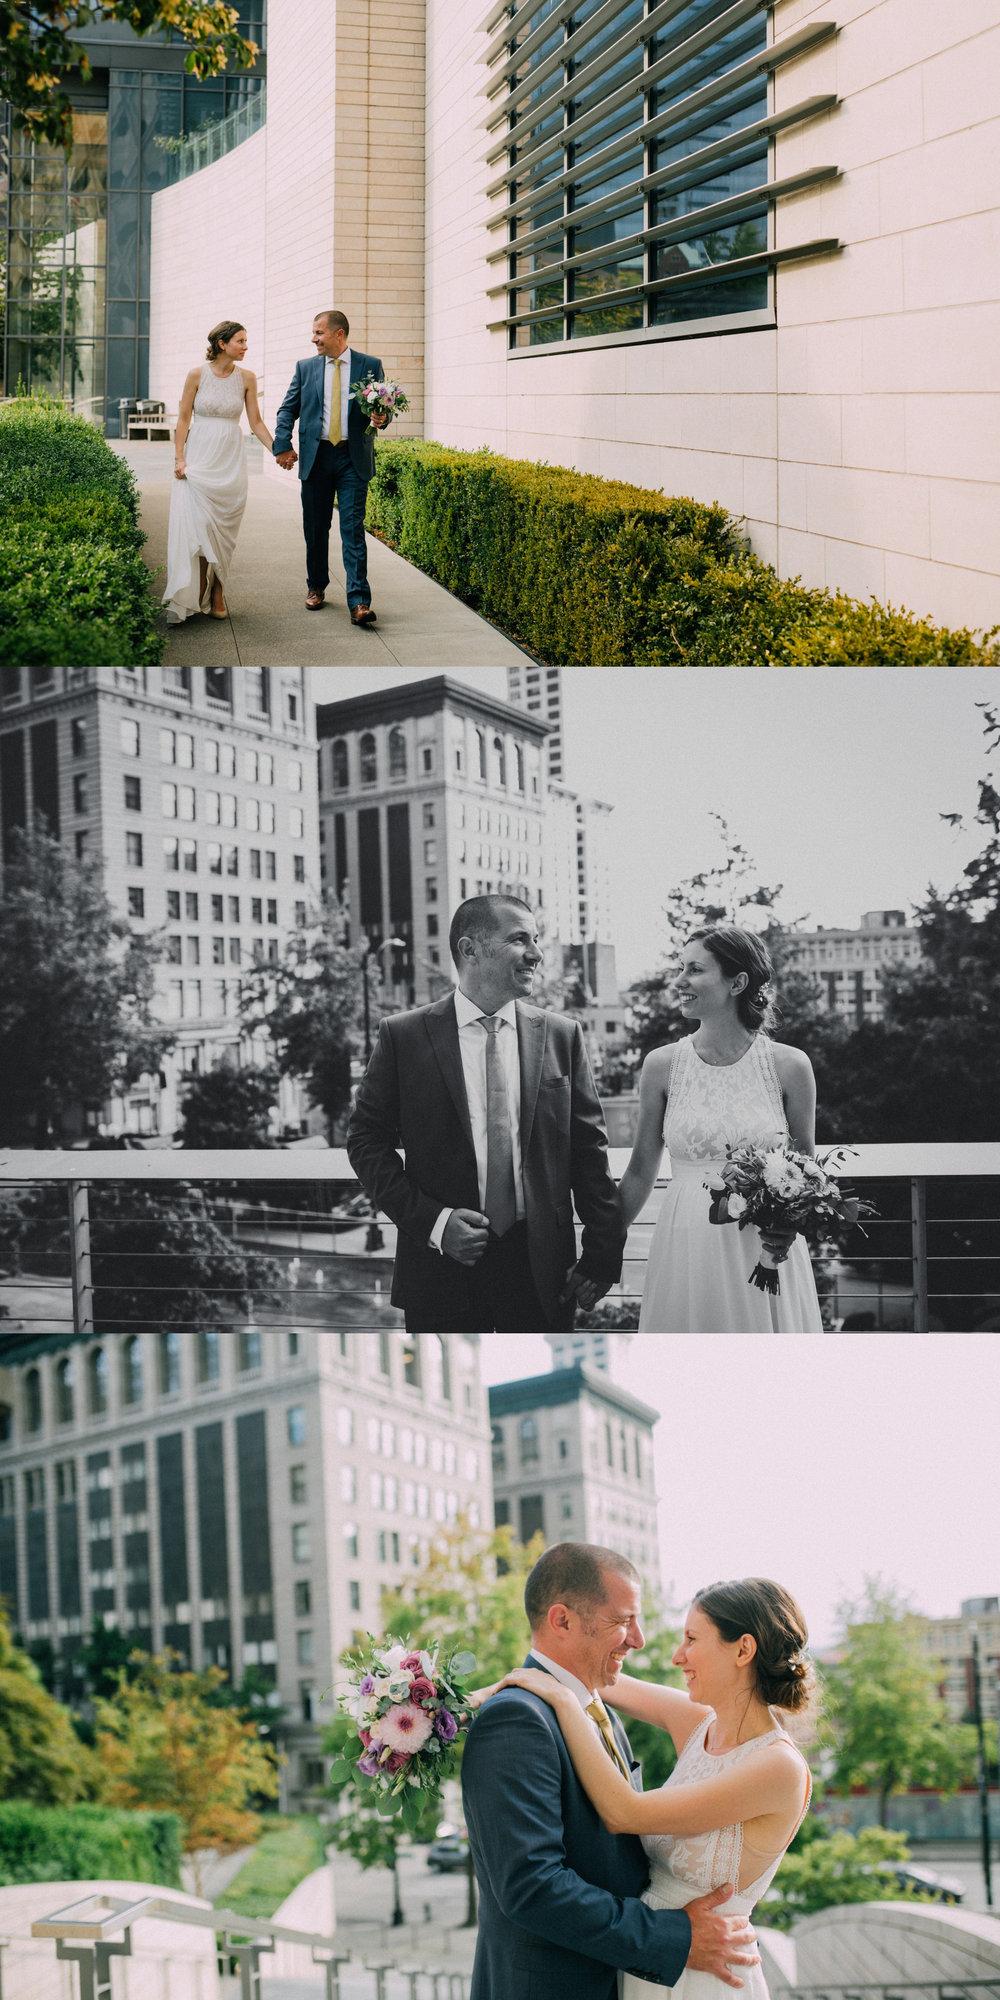 seattle courthouse wedding photographer elopement washington state-12.jpg